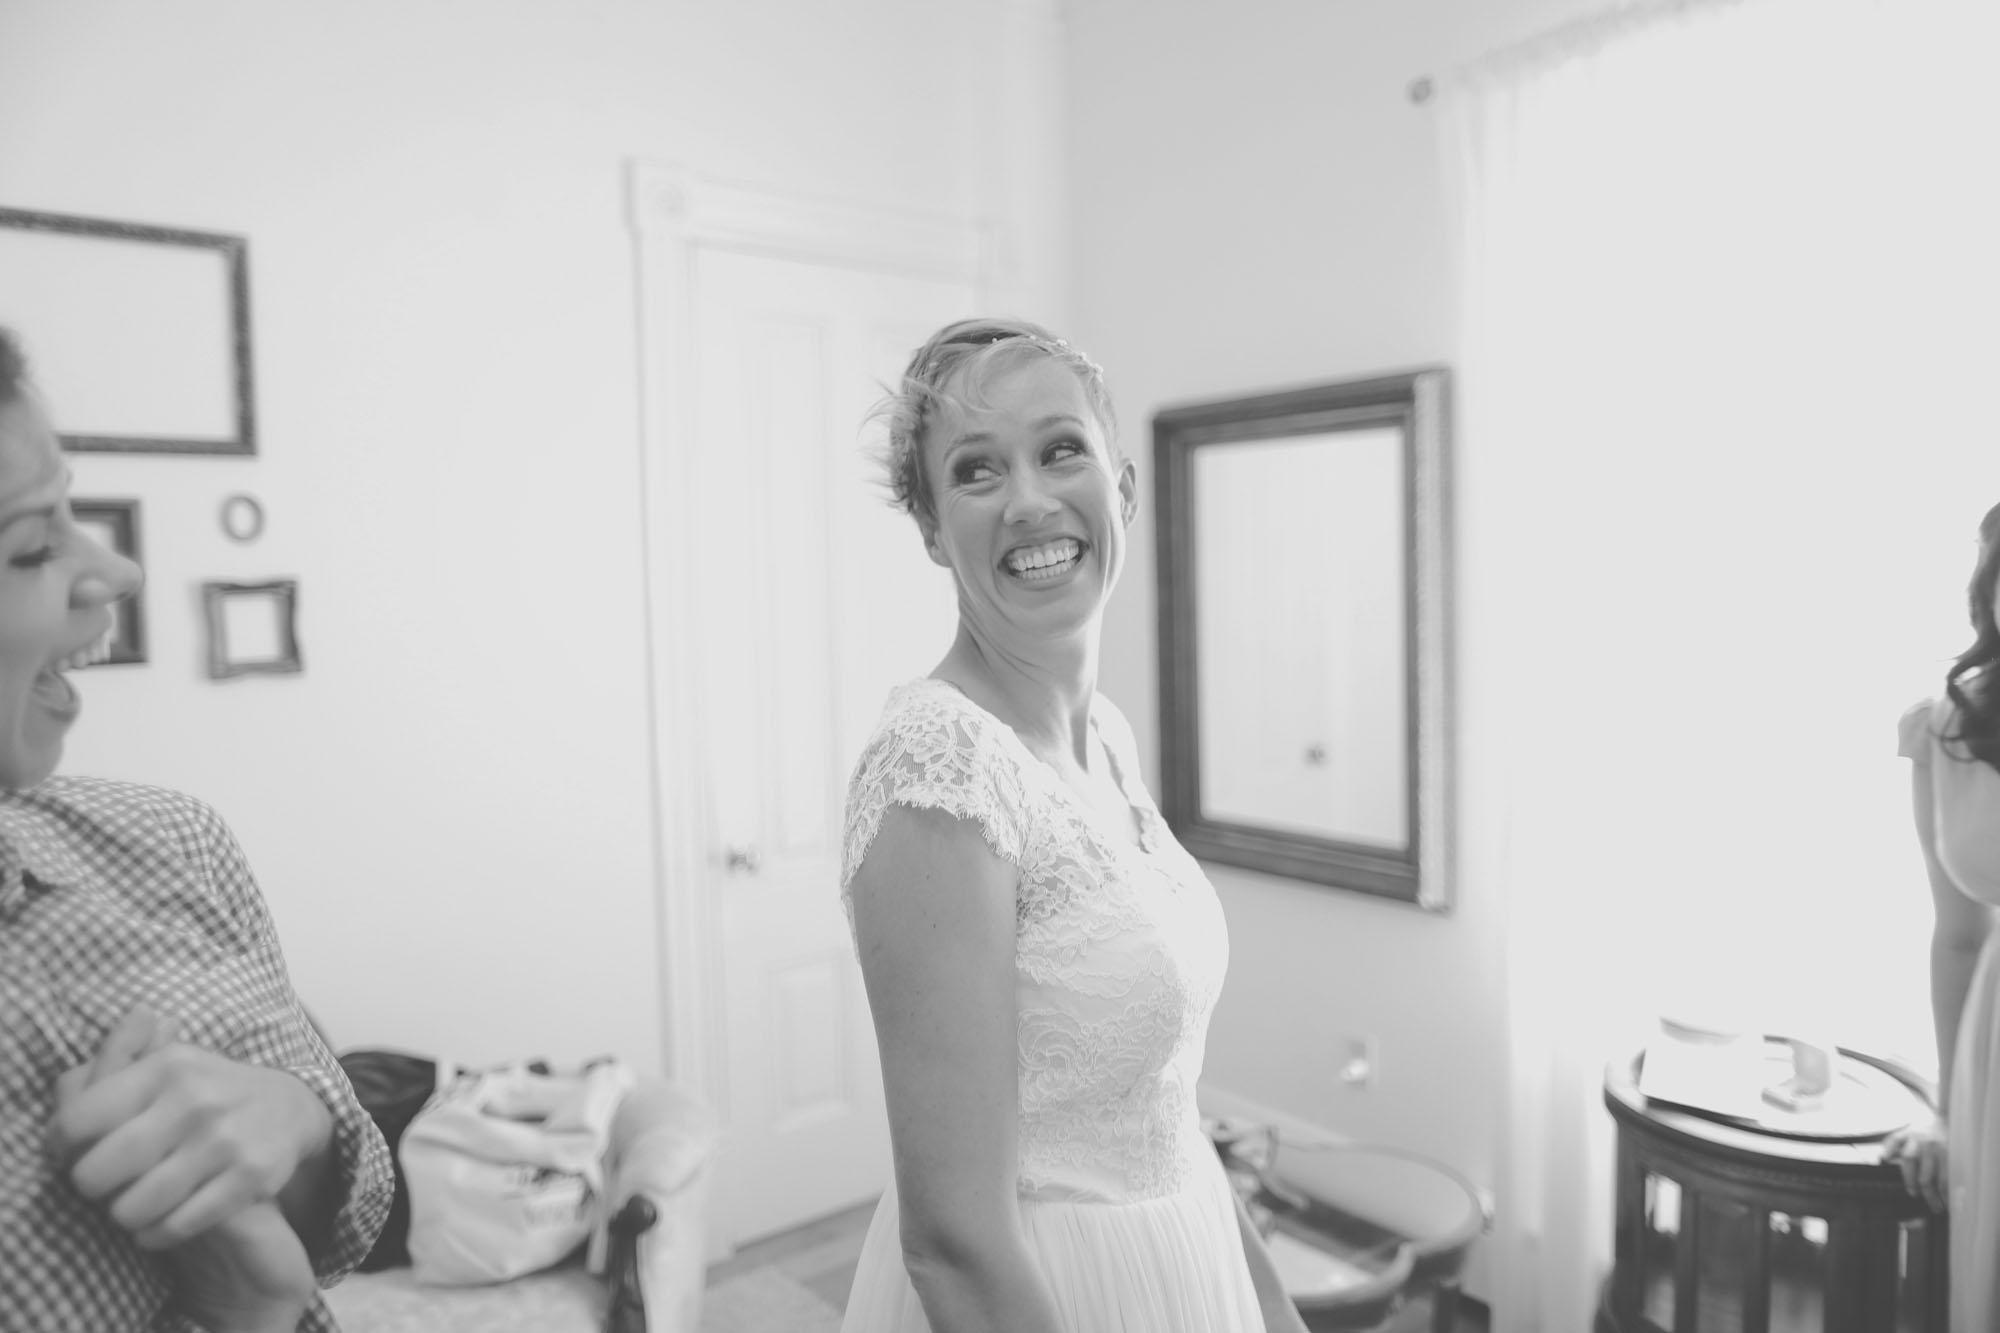 Gretchen_Gause_Petaluma_Olympias_Valley_Wedding_Photo-079.jpg